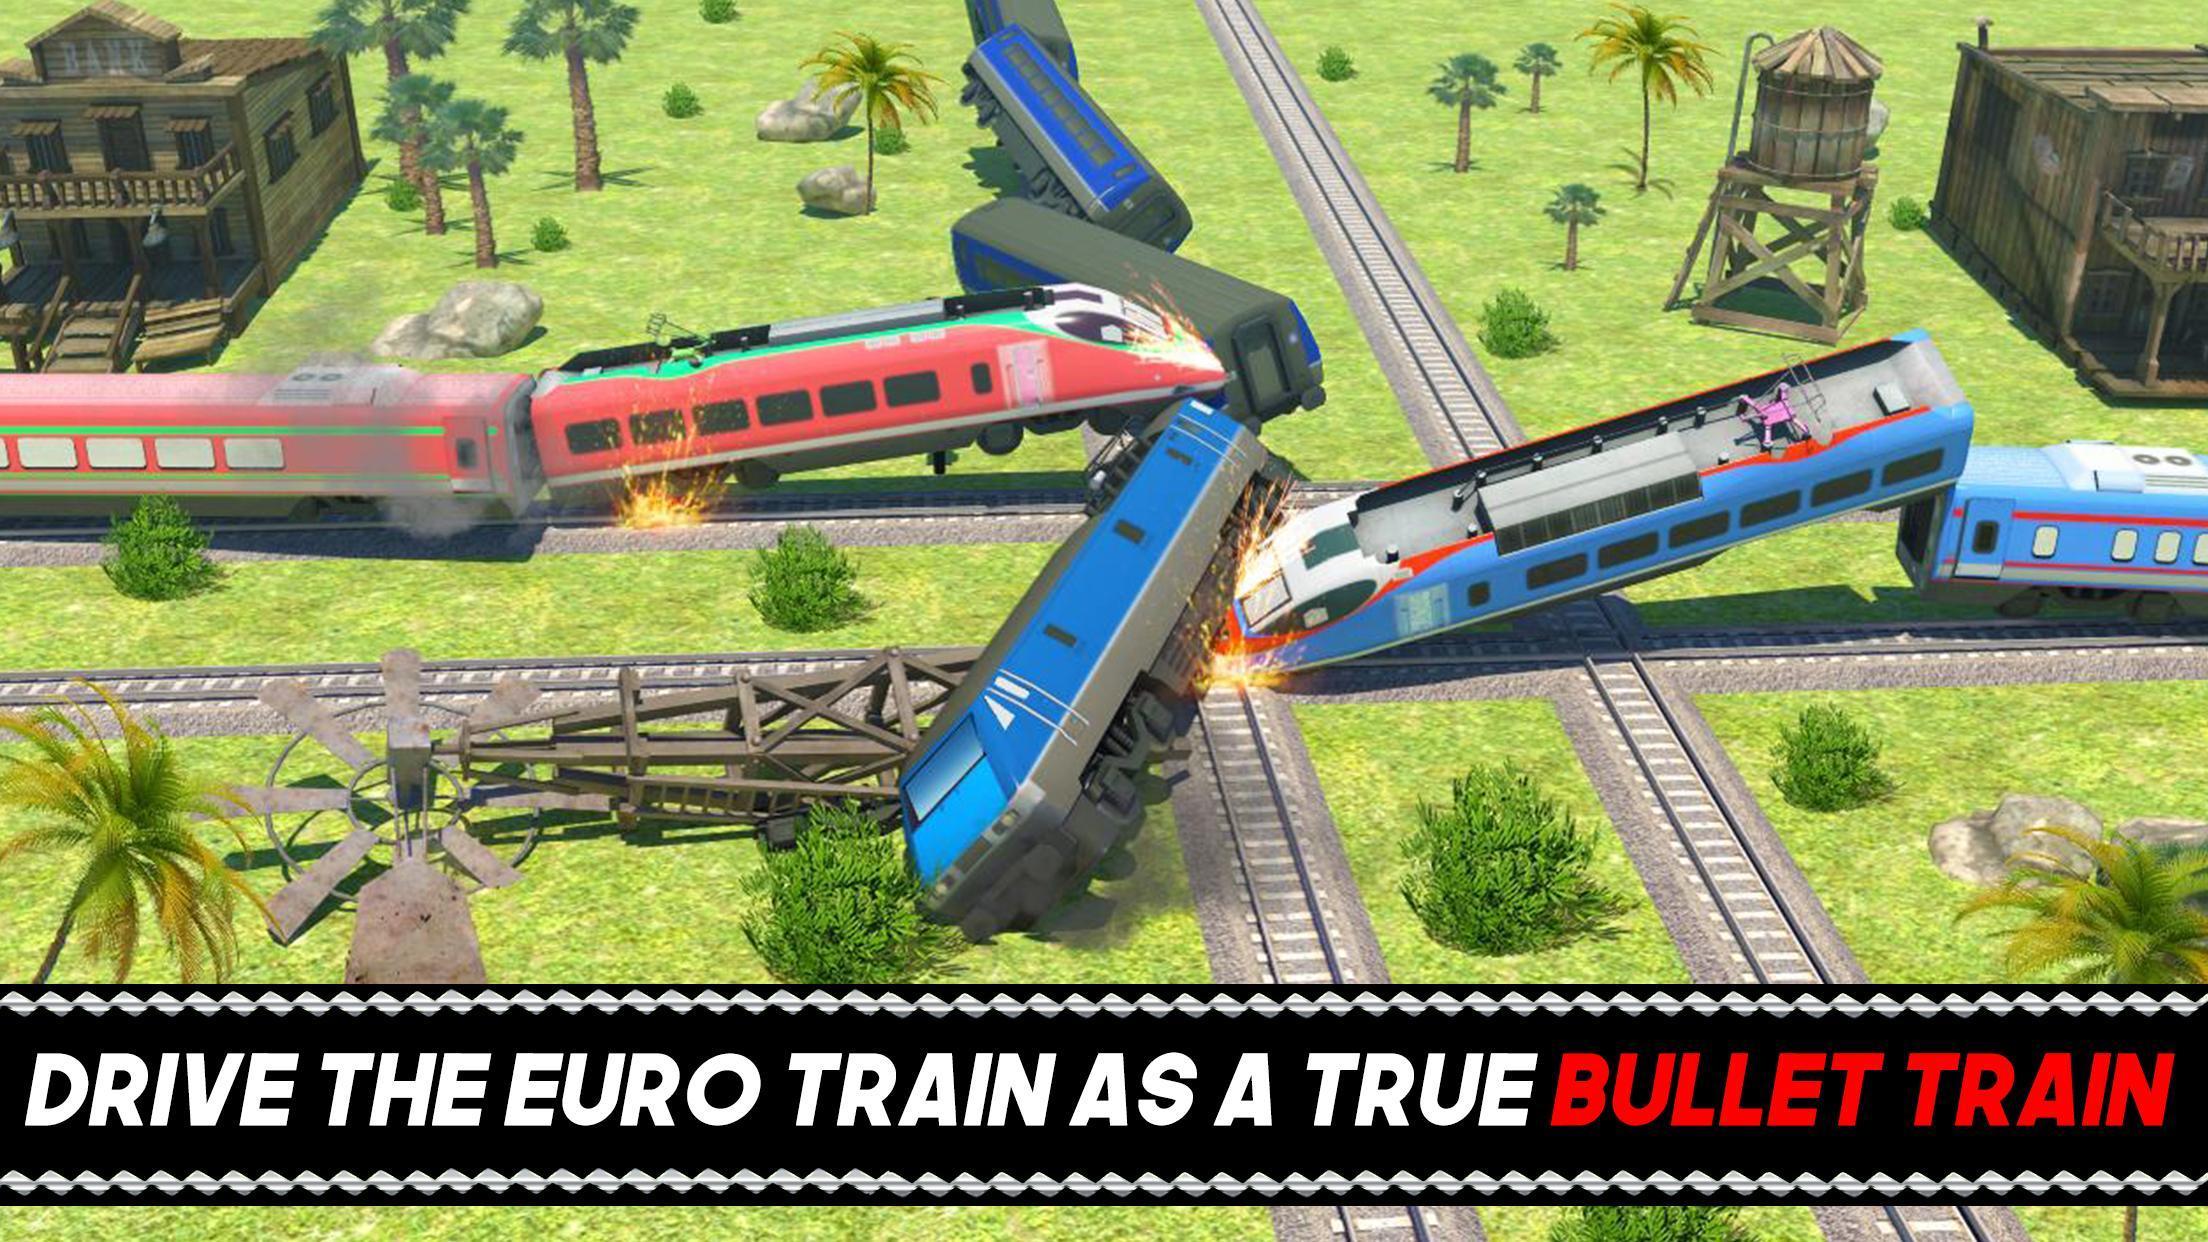 Trainz Driver Simulator - Subway Train Simulator for Android